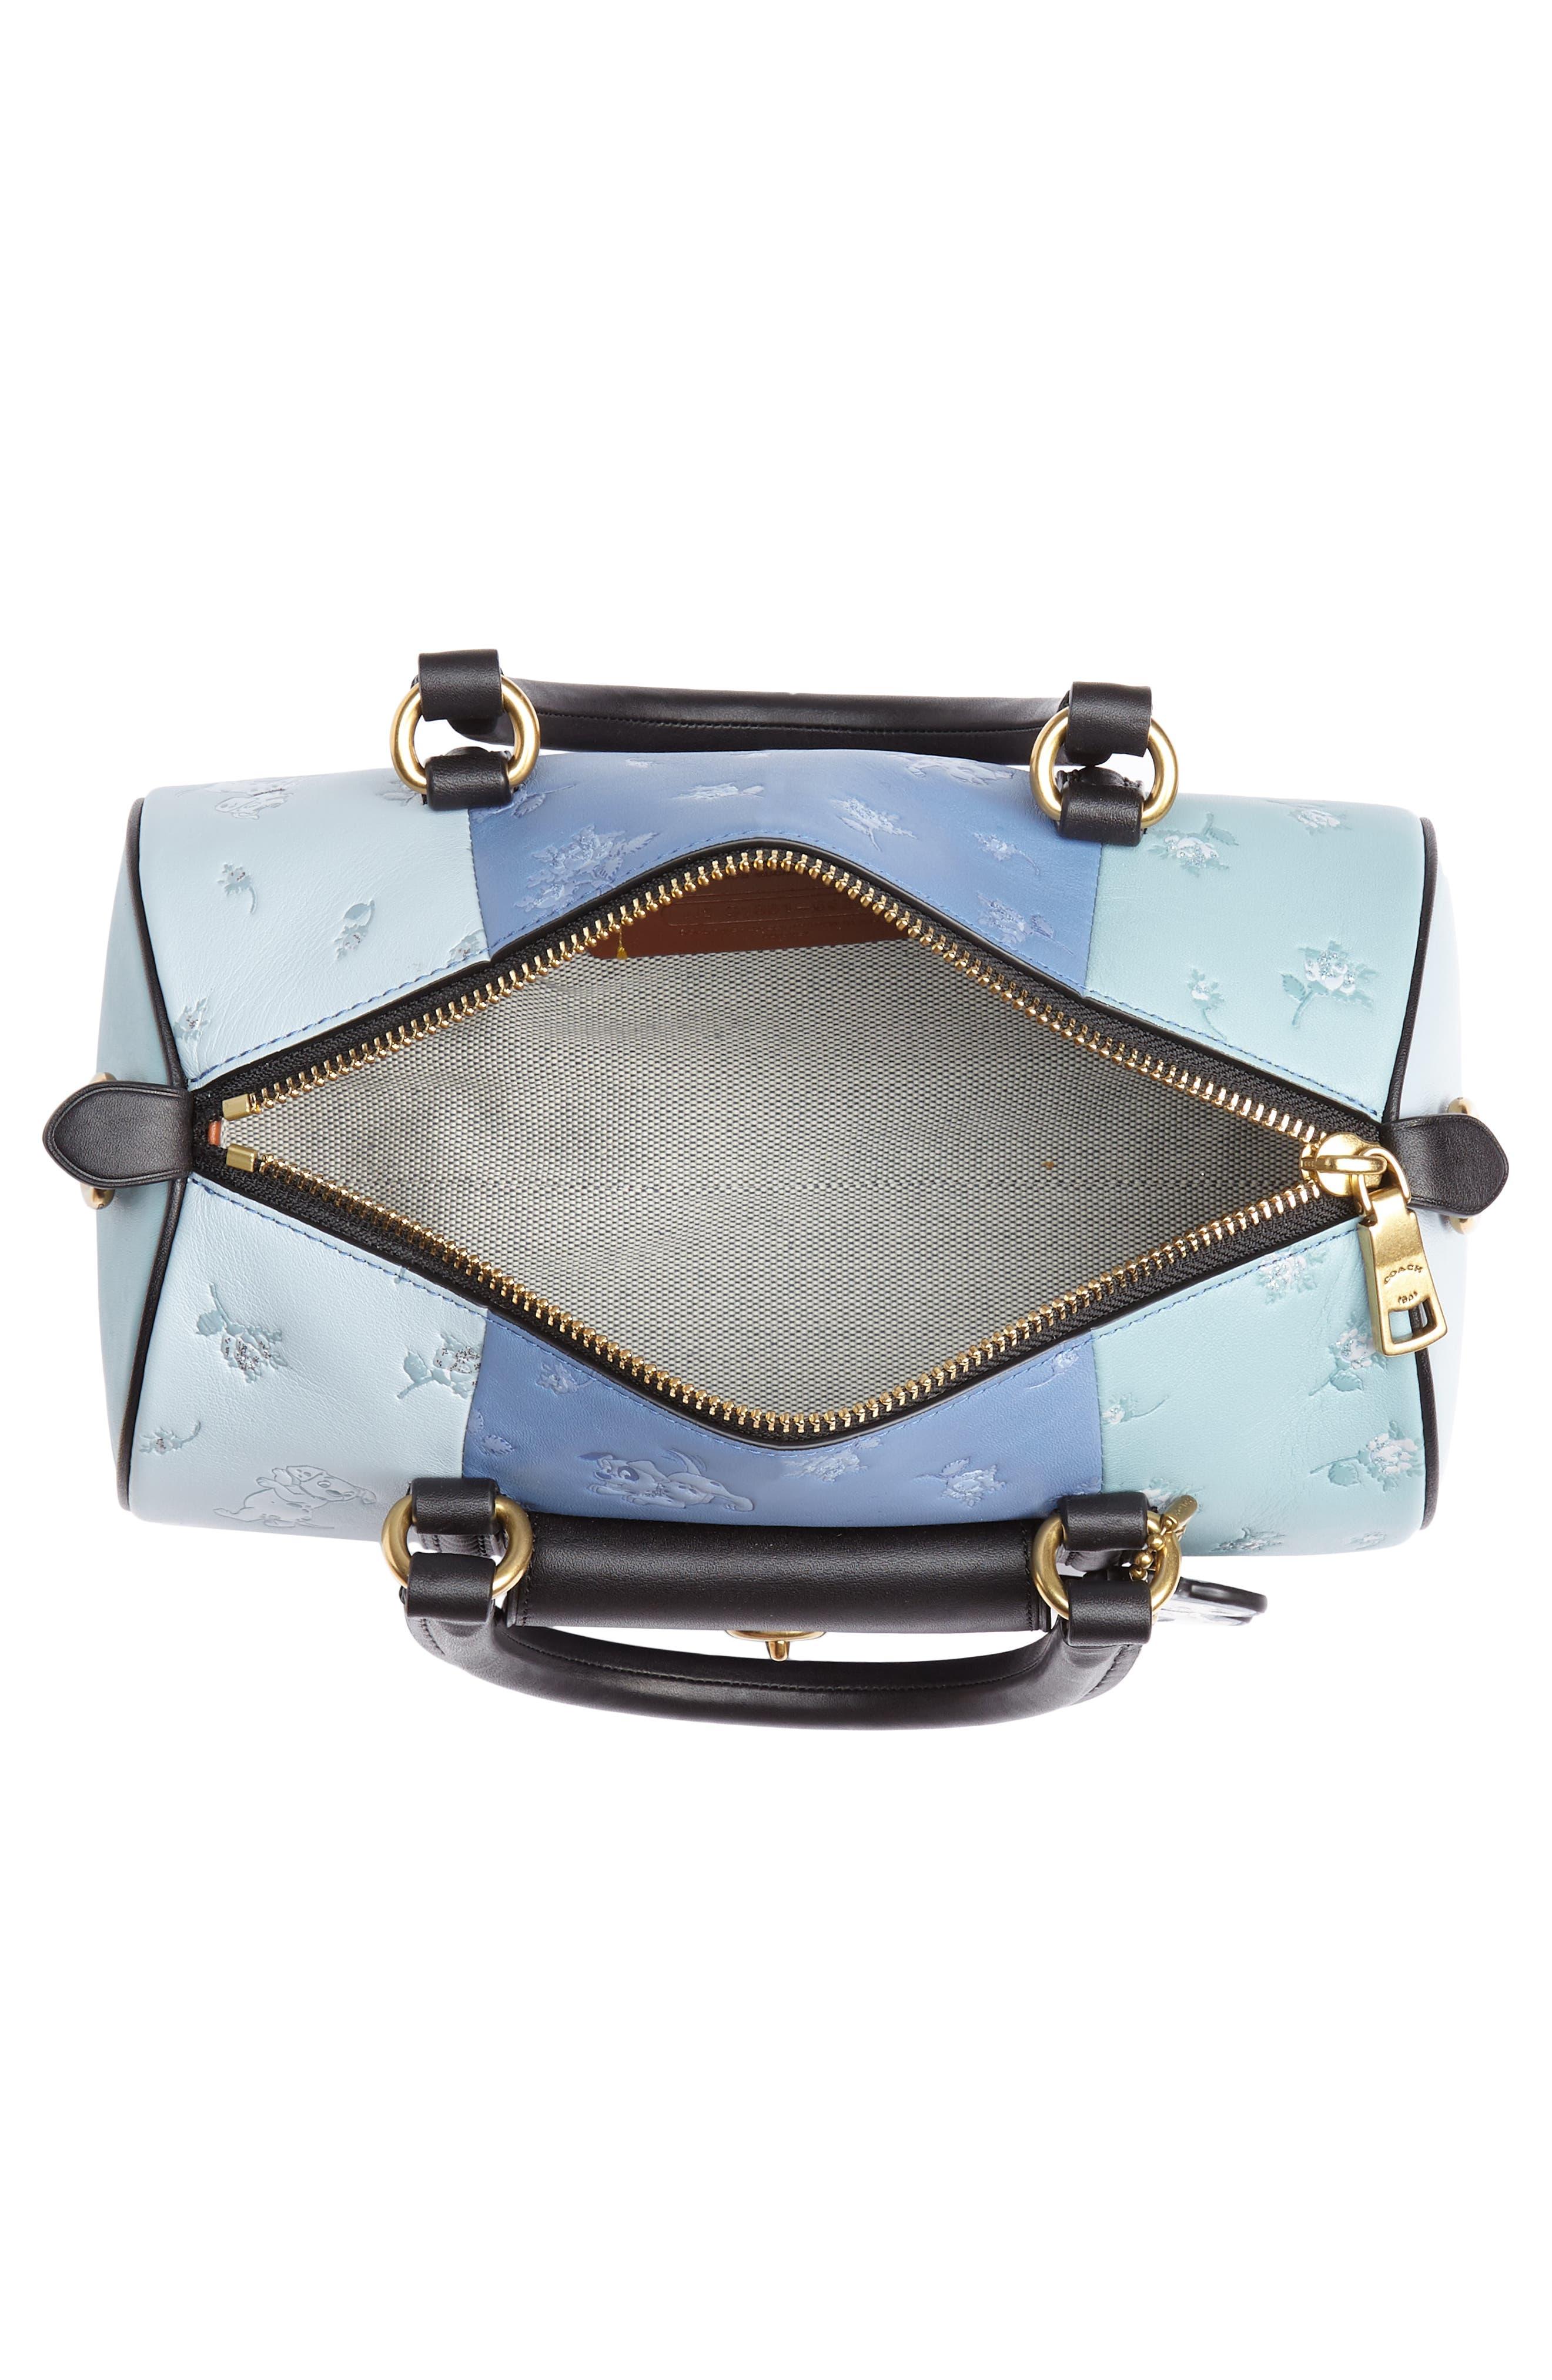 Disney x COACH 101 Dalmatians Leather Barrel Bag,                             Alternate thumbnail 4, color,                             402